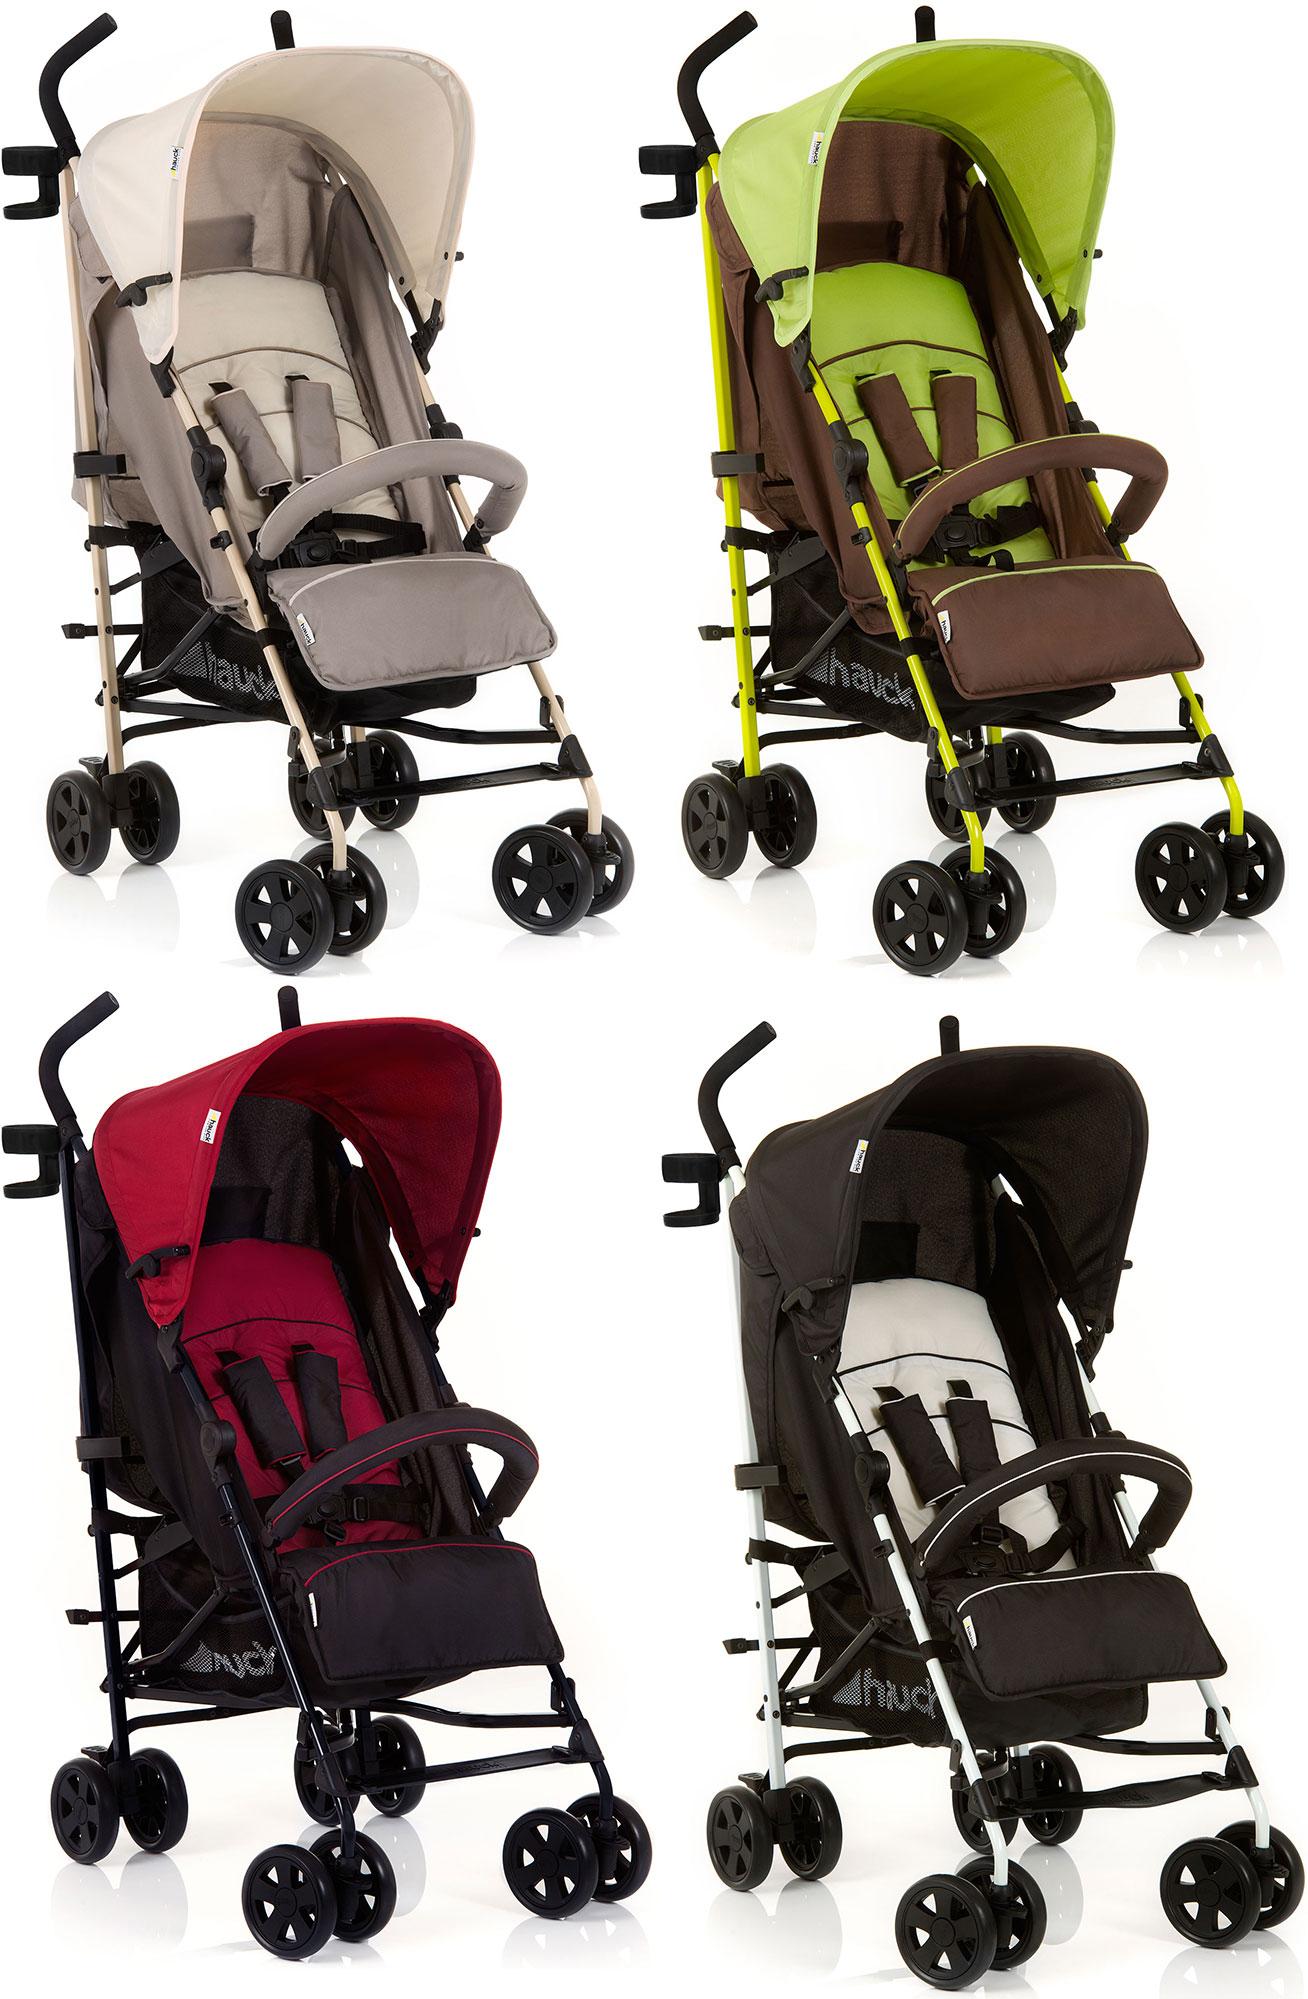 hauck speed plus buggy pushchair stroller cup holder baby. Black Bedroom Furniture Sets. Home Design Ideas